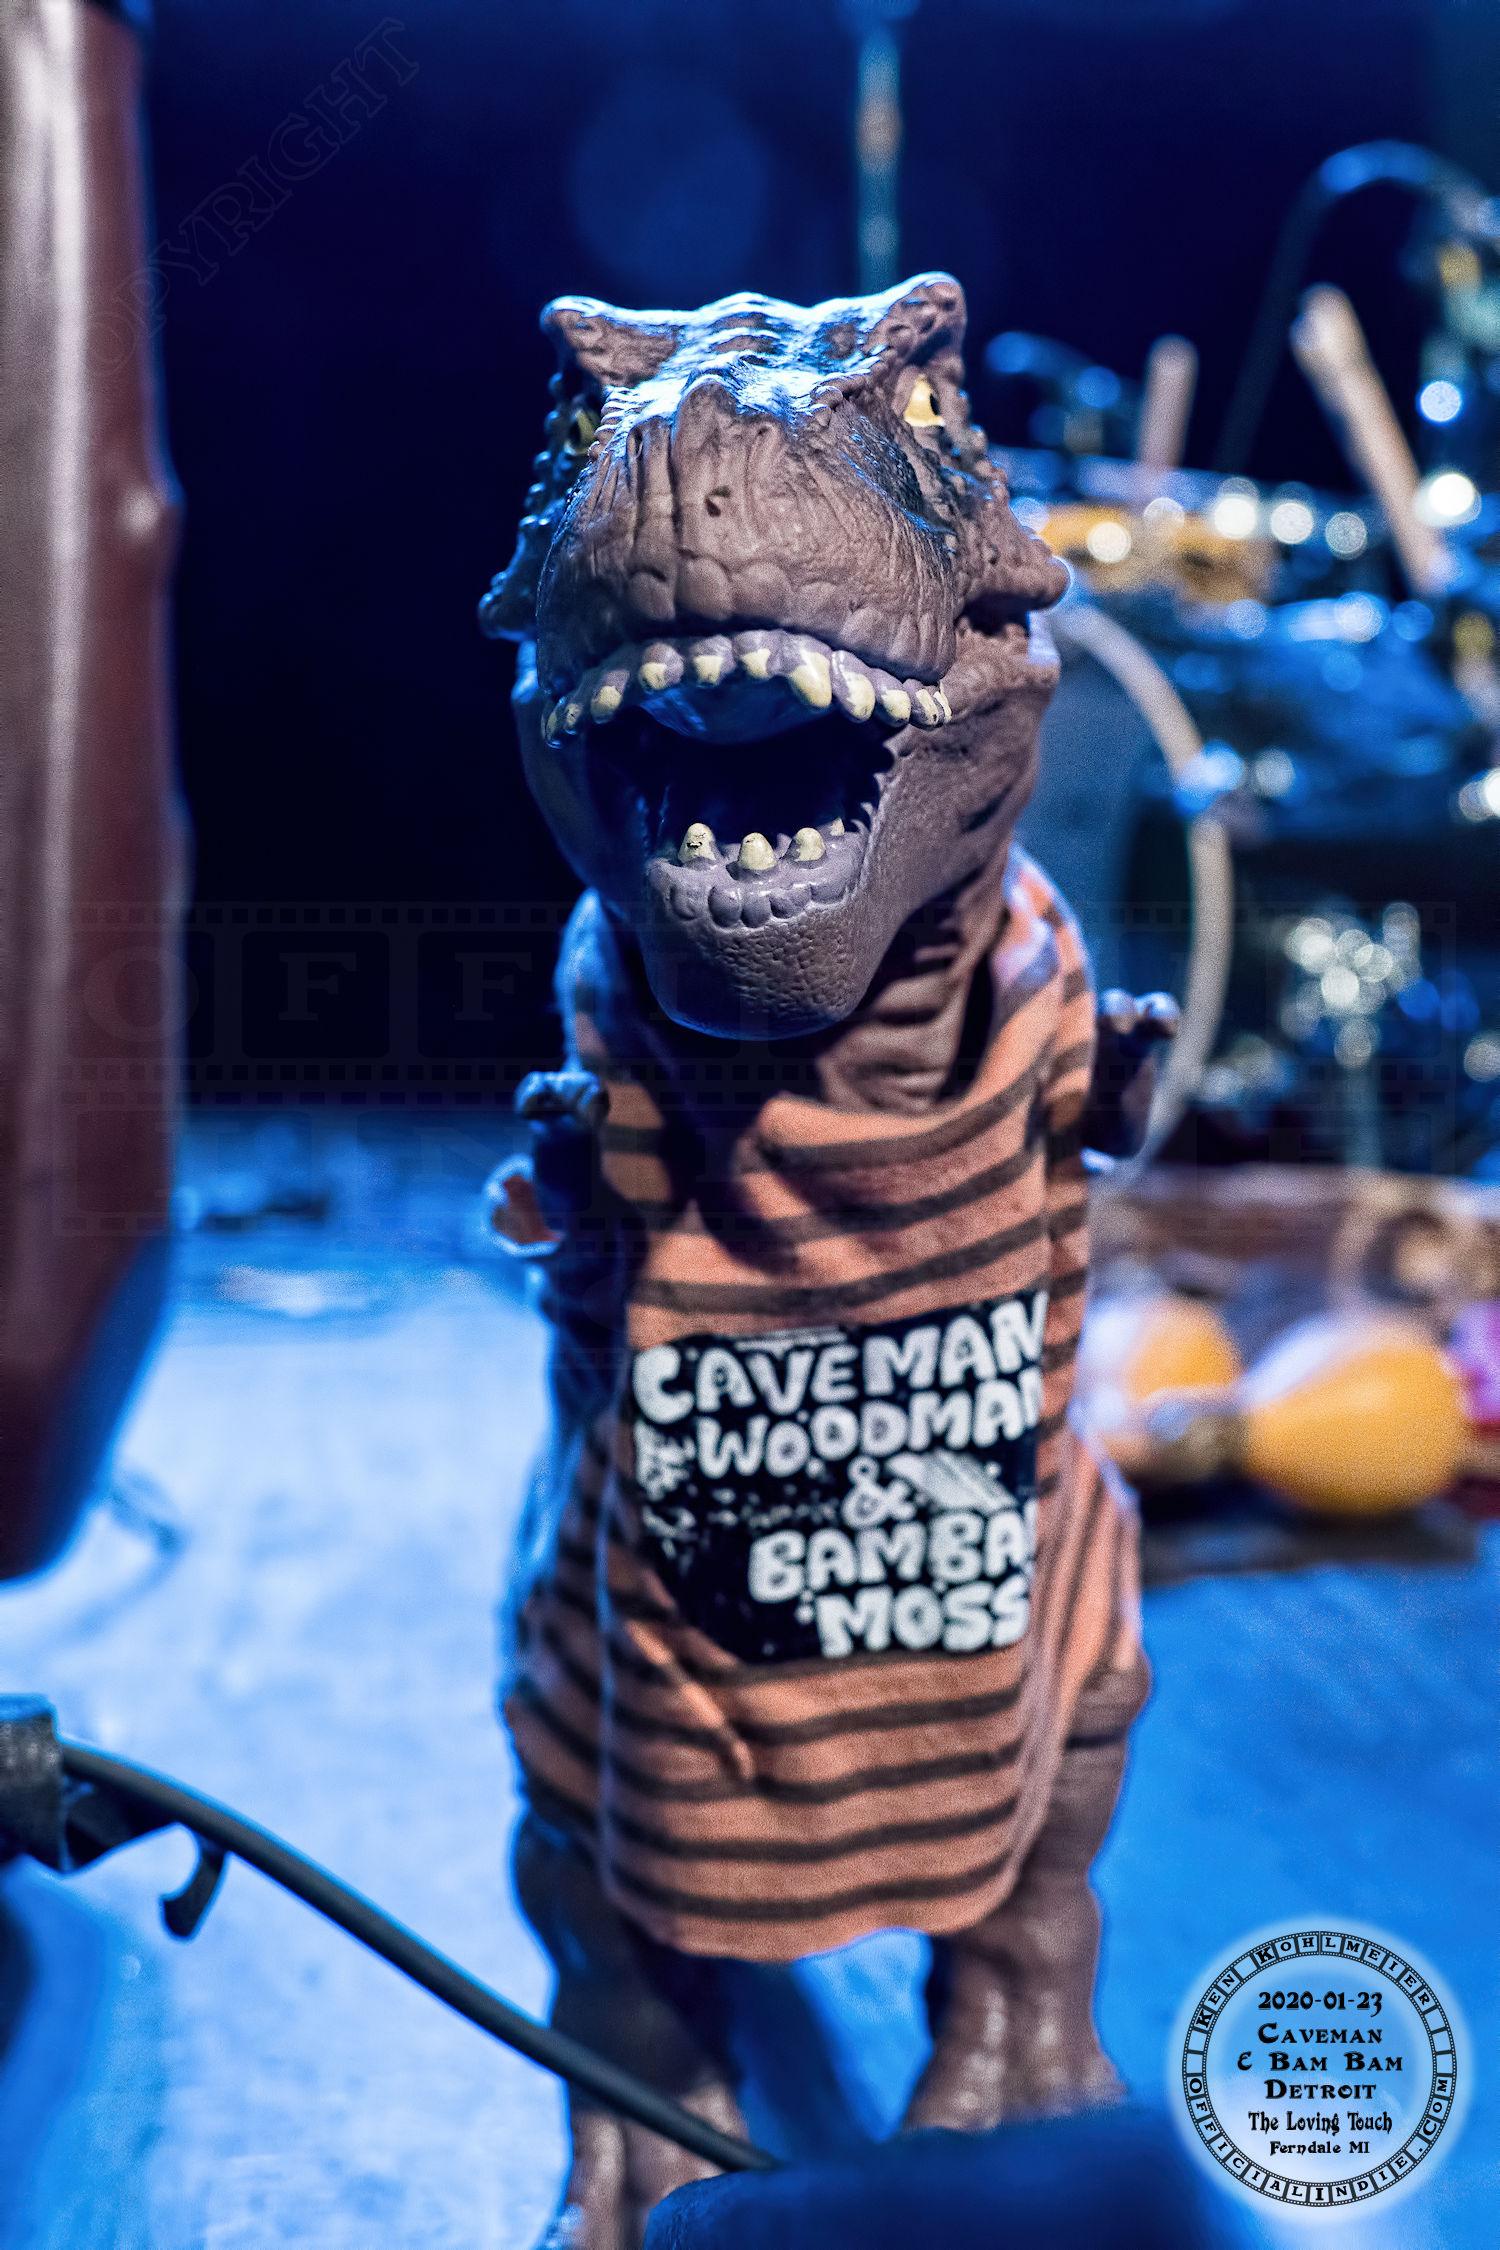 Caveman001